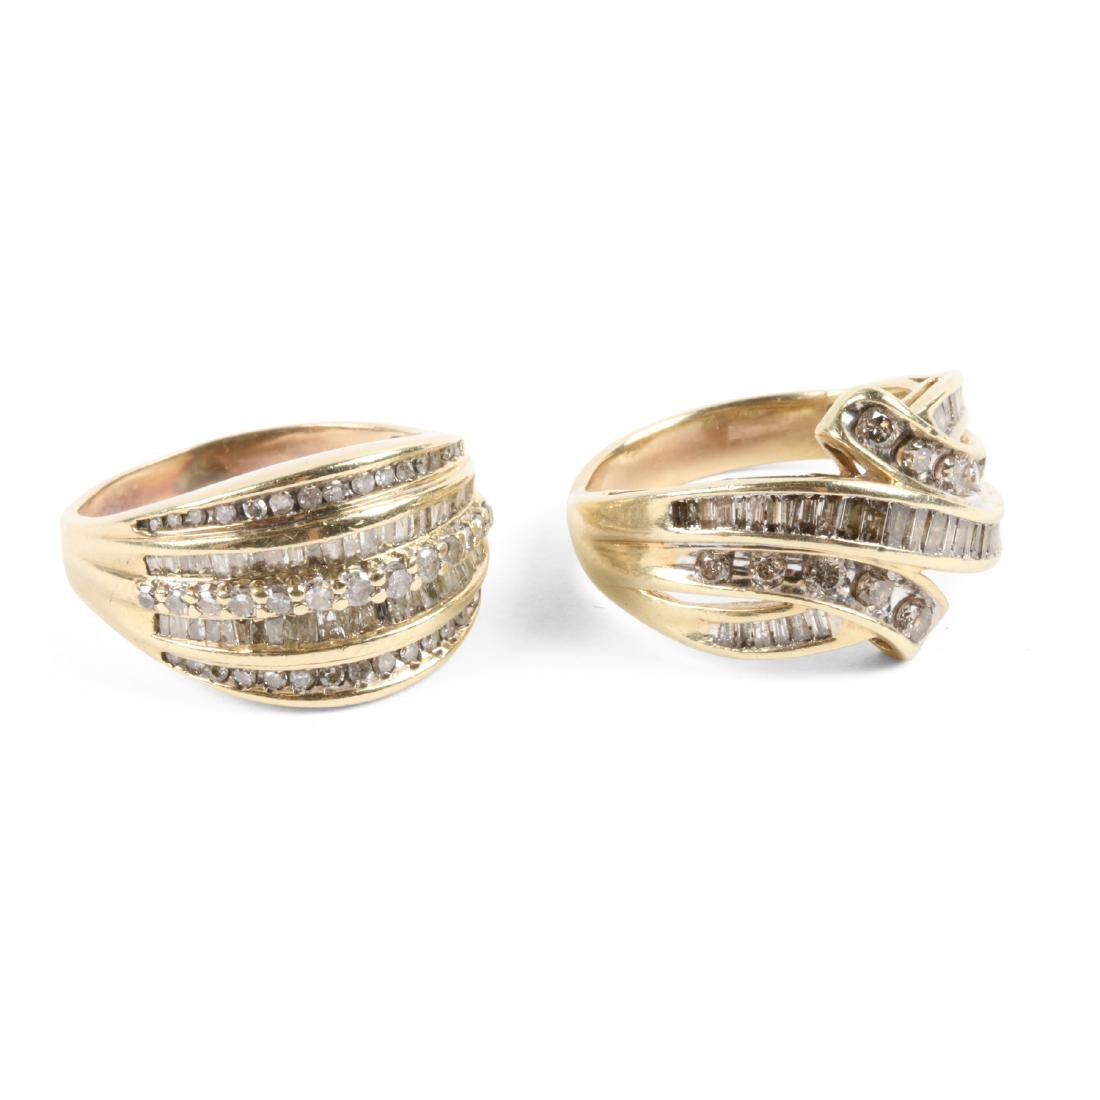 A Pair, 10K Gold & Diamond Rings